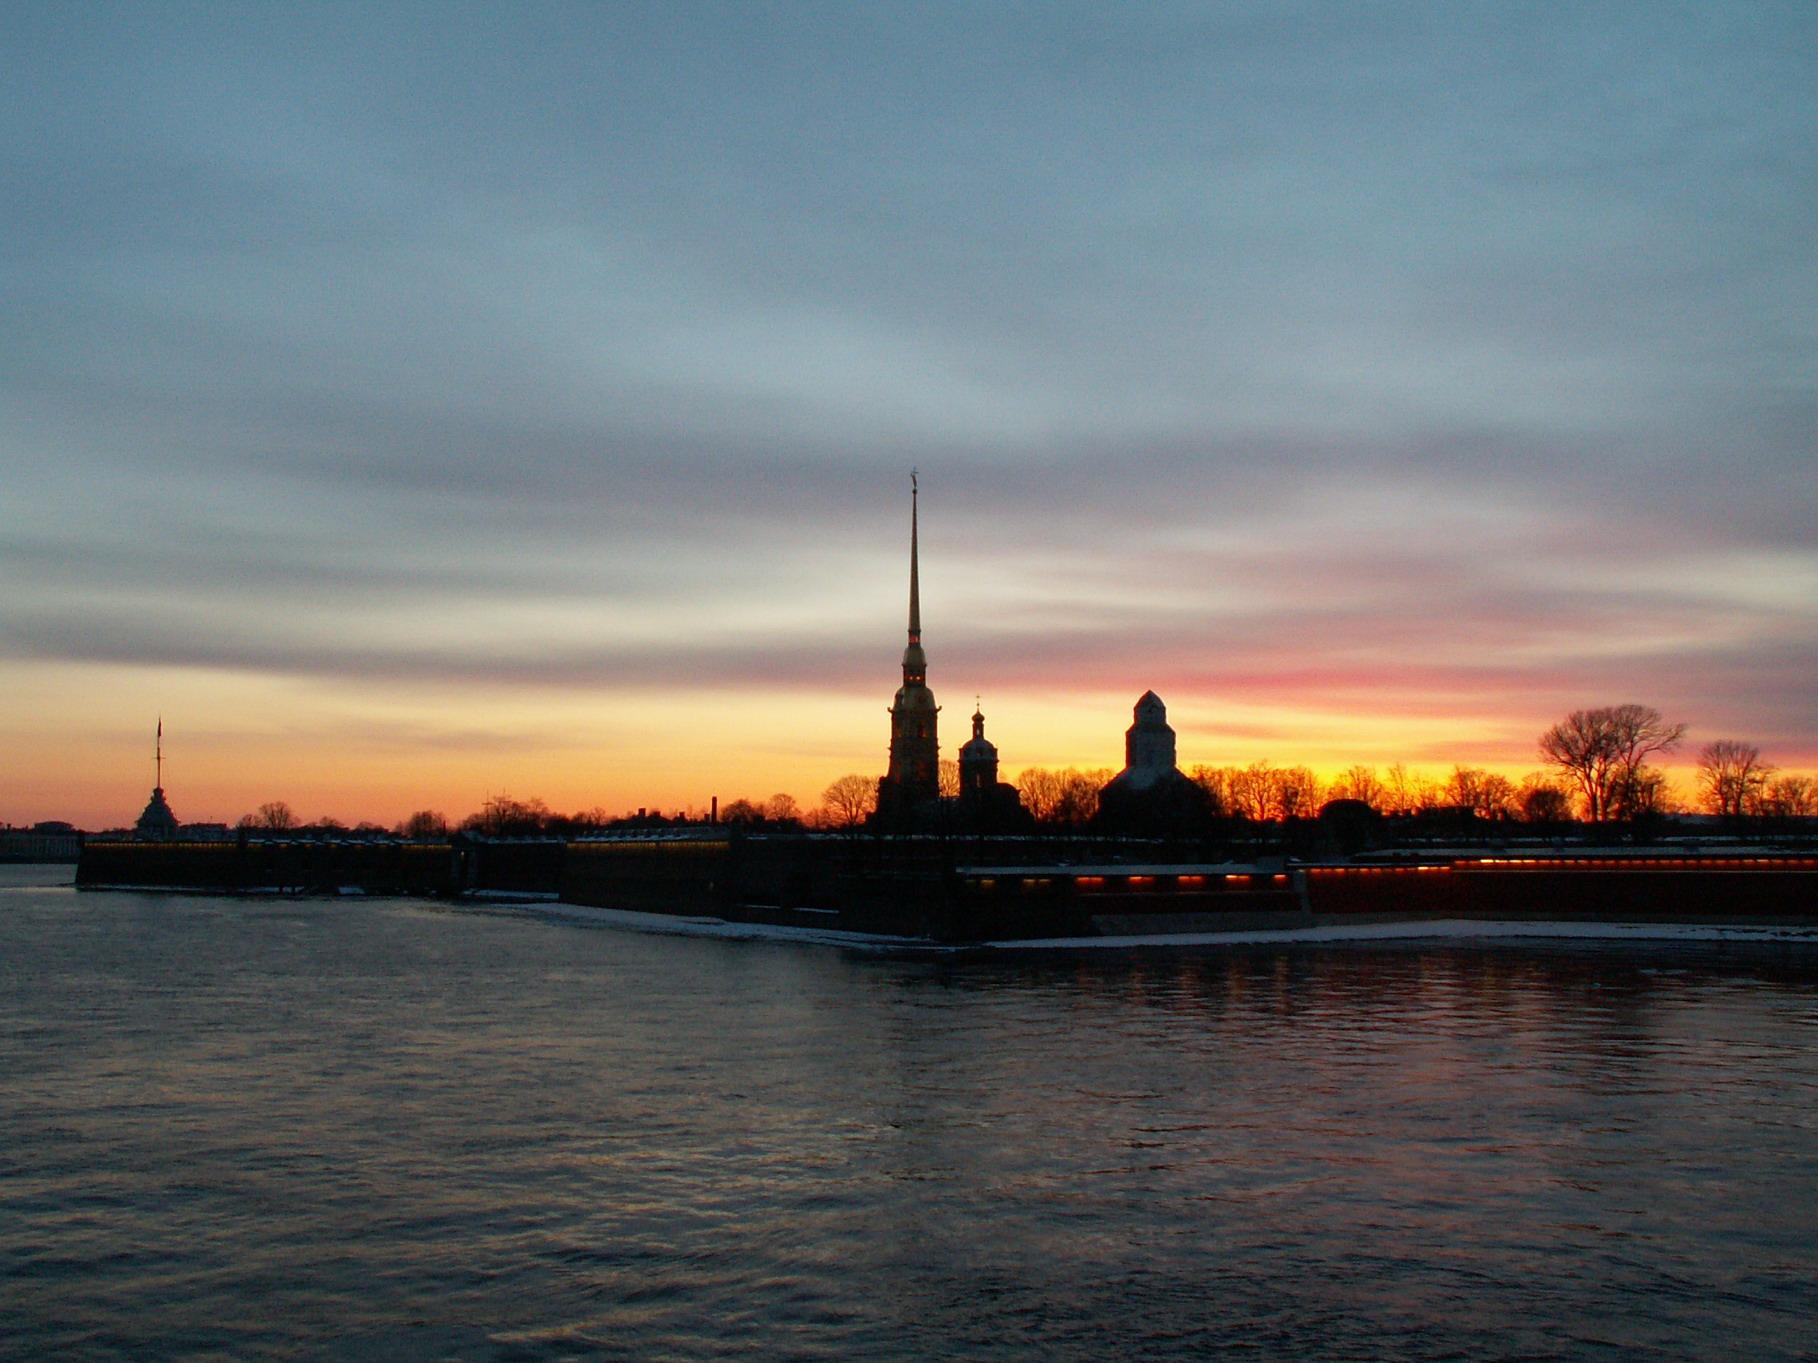 Закат на Неве. Блиц: рассветы и закаты